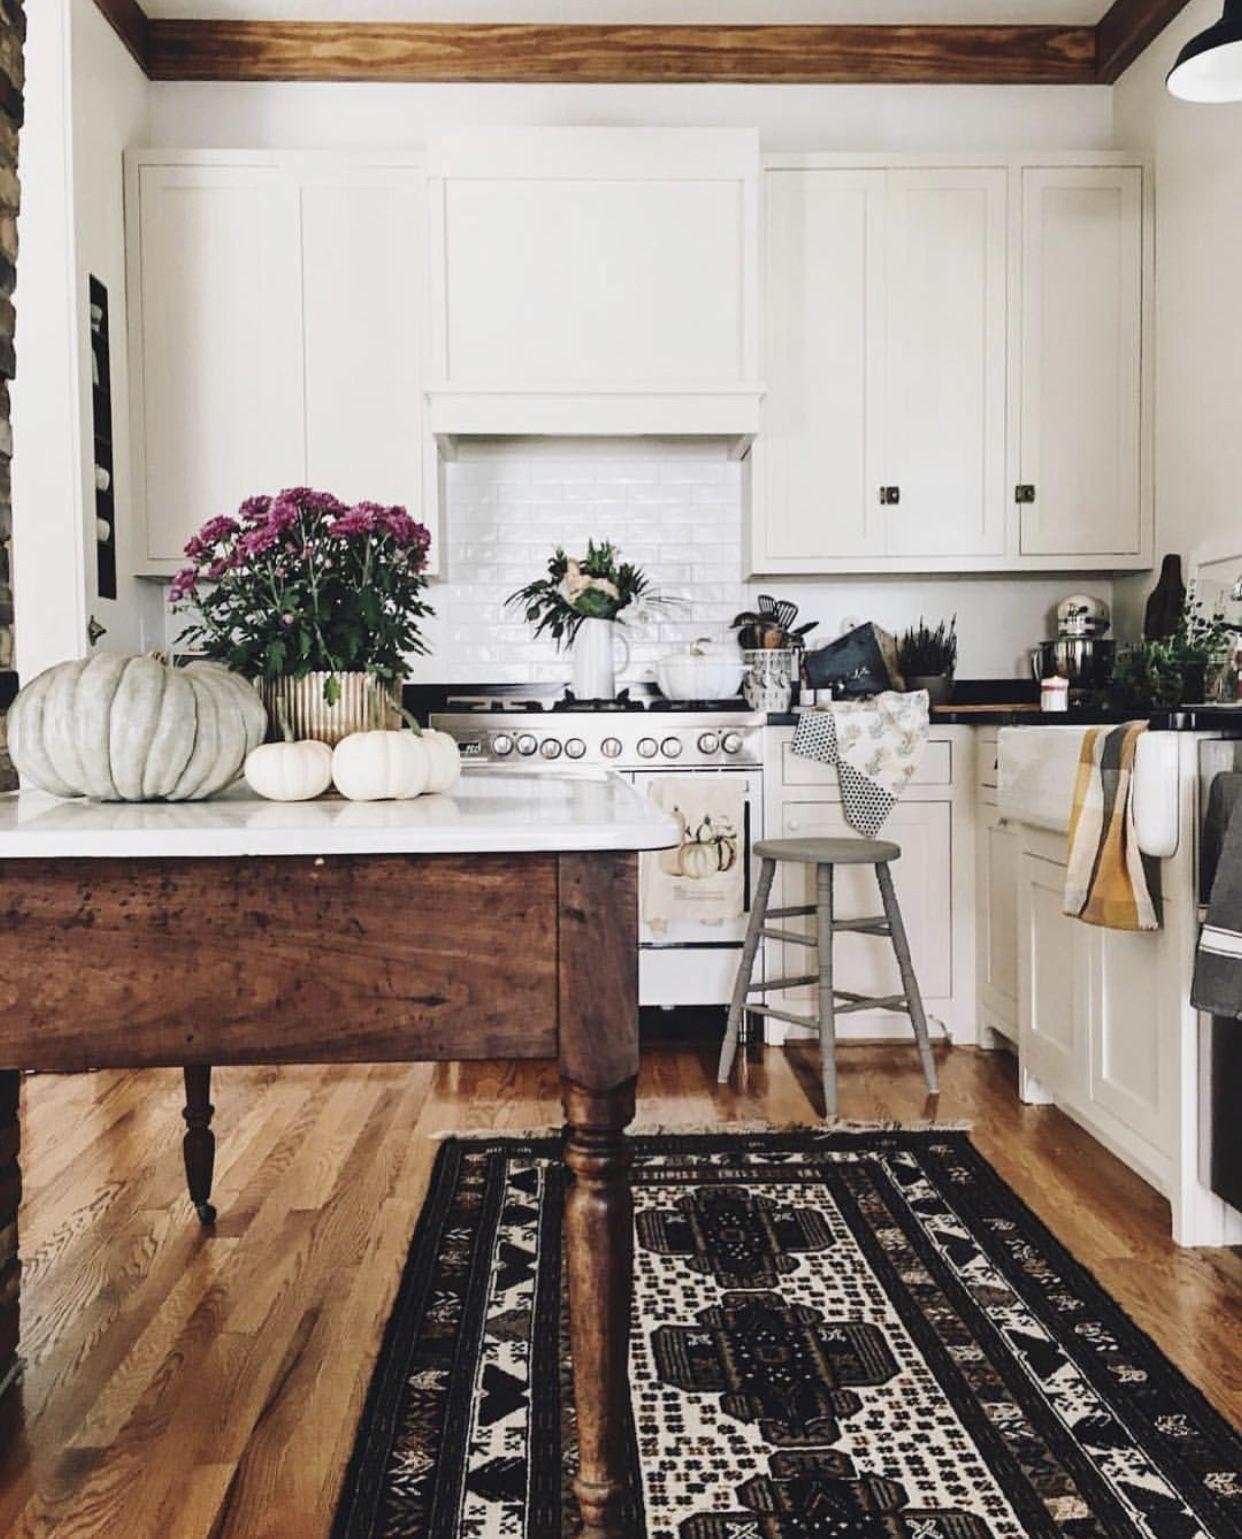 33 Modern Style Cozy Wooden Kitchen Design Ideas: Kitchen. White Cabinets. White Subway Tile. Darkwood Table